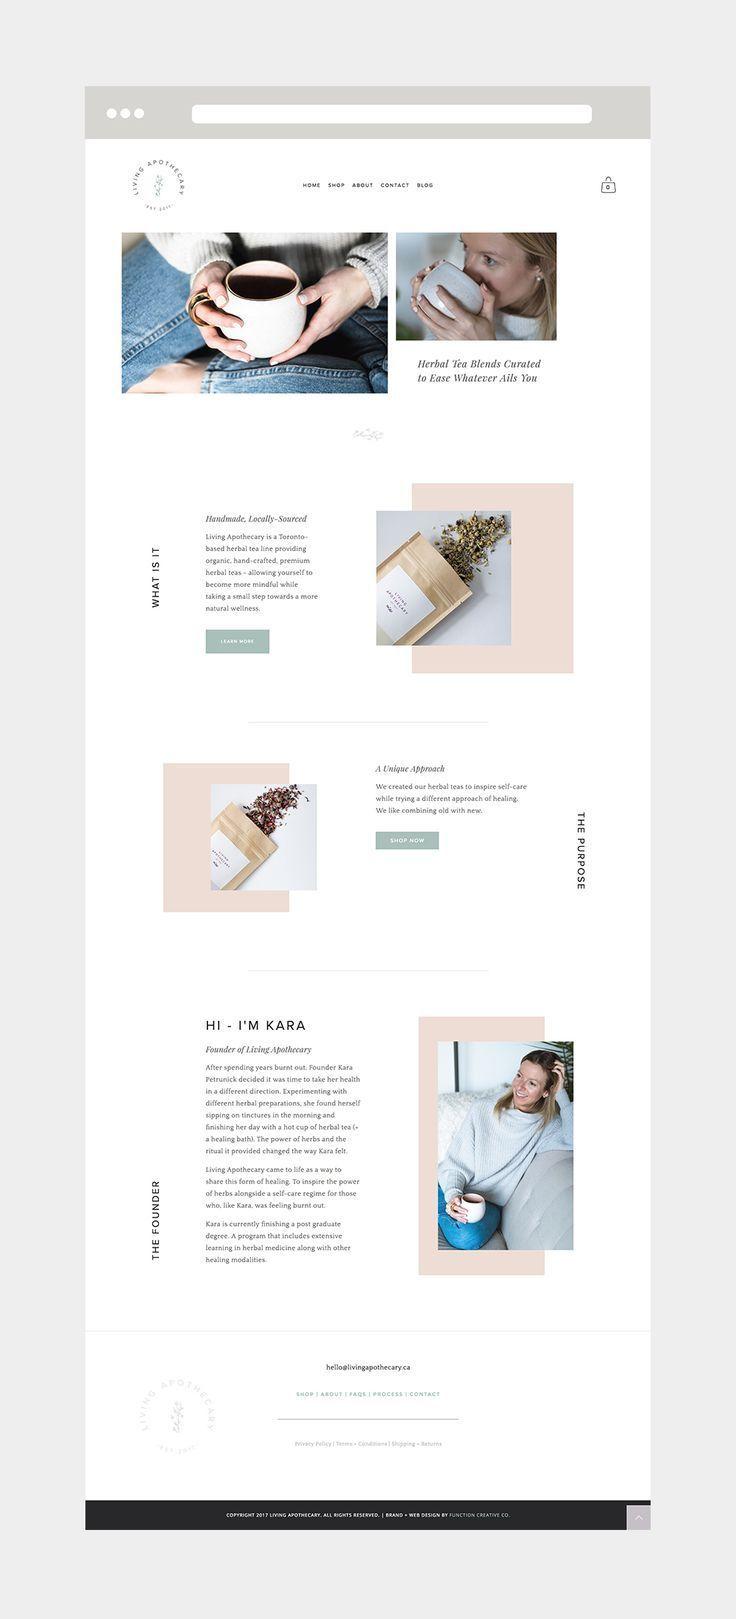 Stunning Website Design By Danielle Joseph Function Creative Co For A Handmade Herbal Tea Brand Wel Simple Web Design Web Development Design Web Design Tips